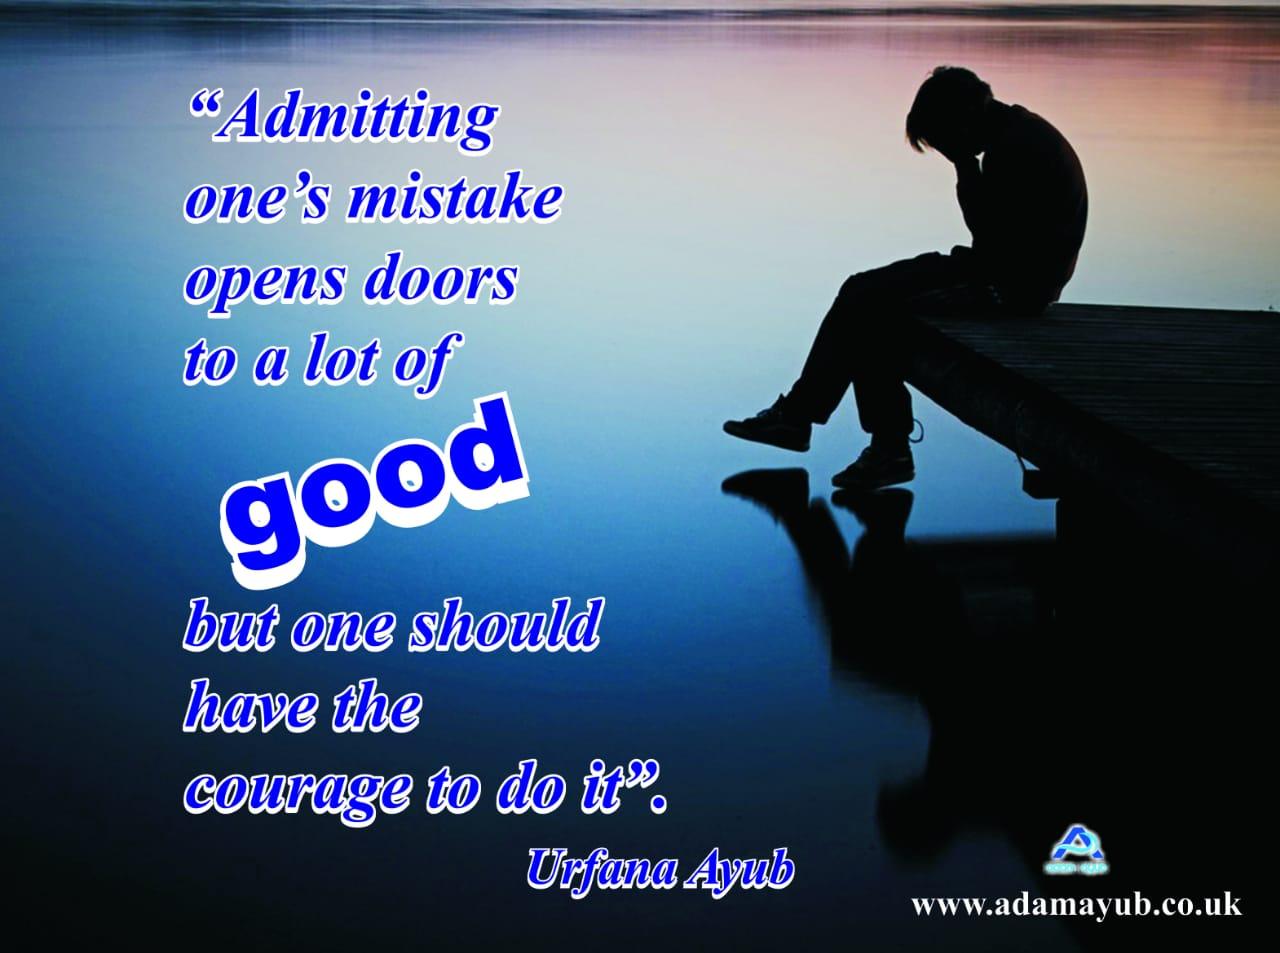 Admitting ones mistake